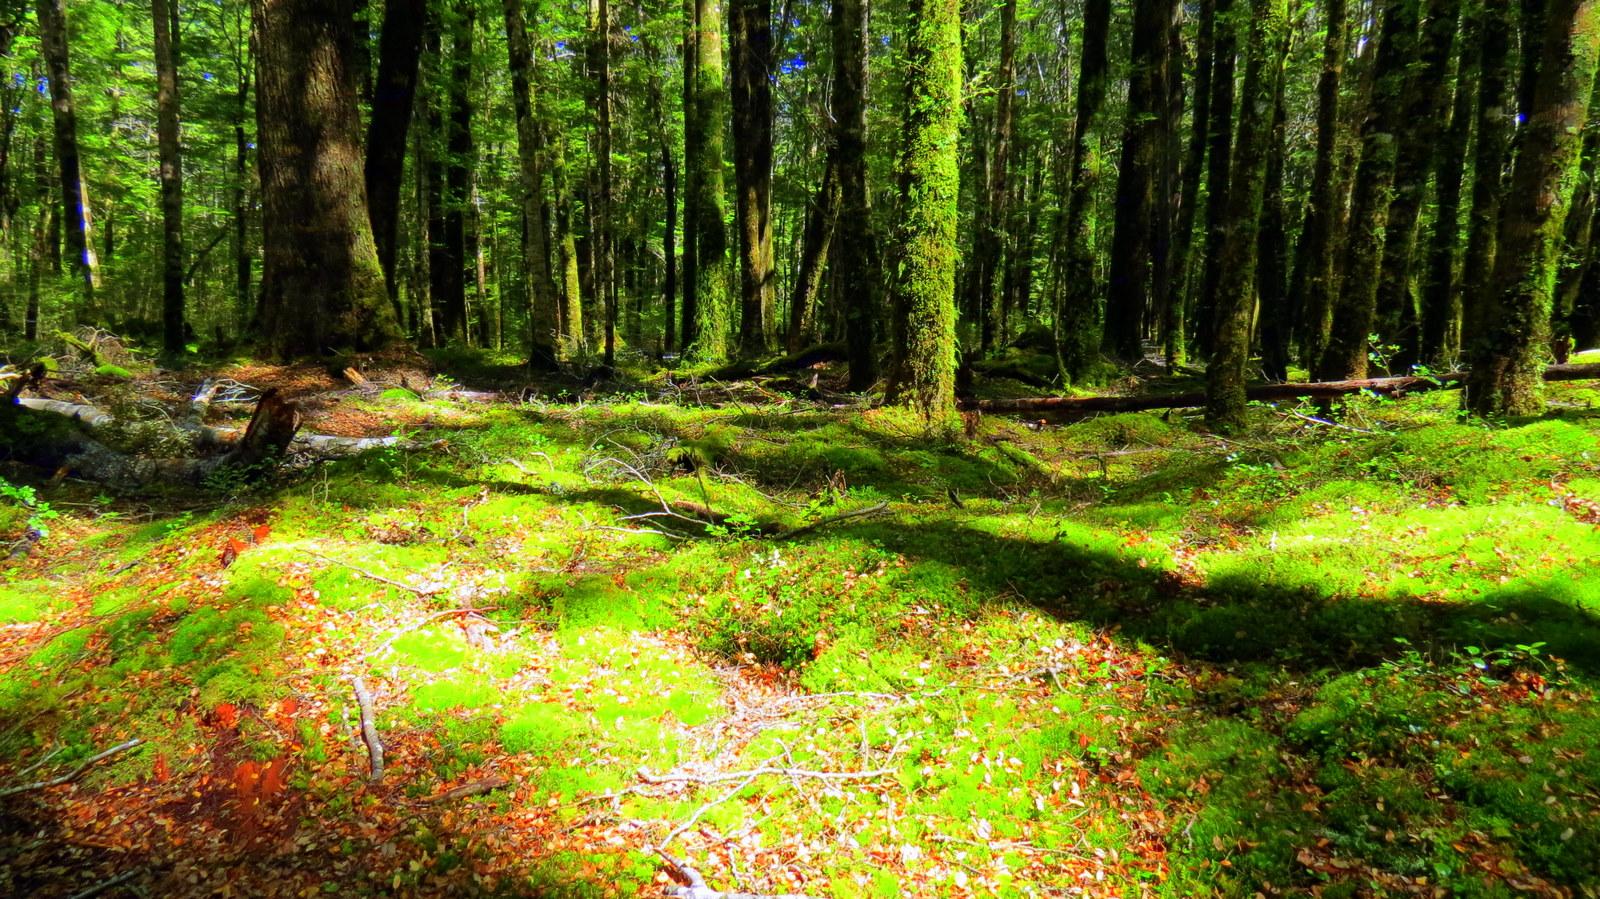 kepler-track-moss-formation.jpg